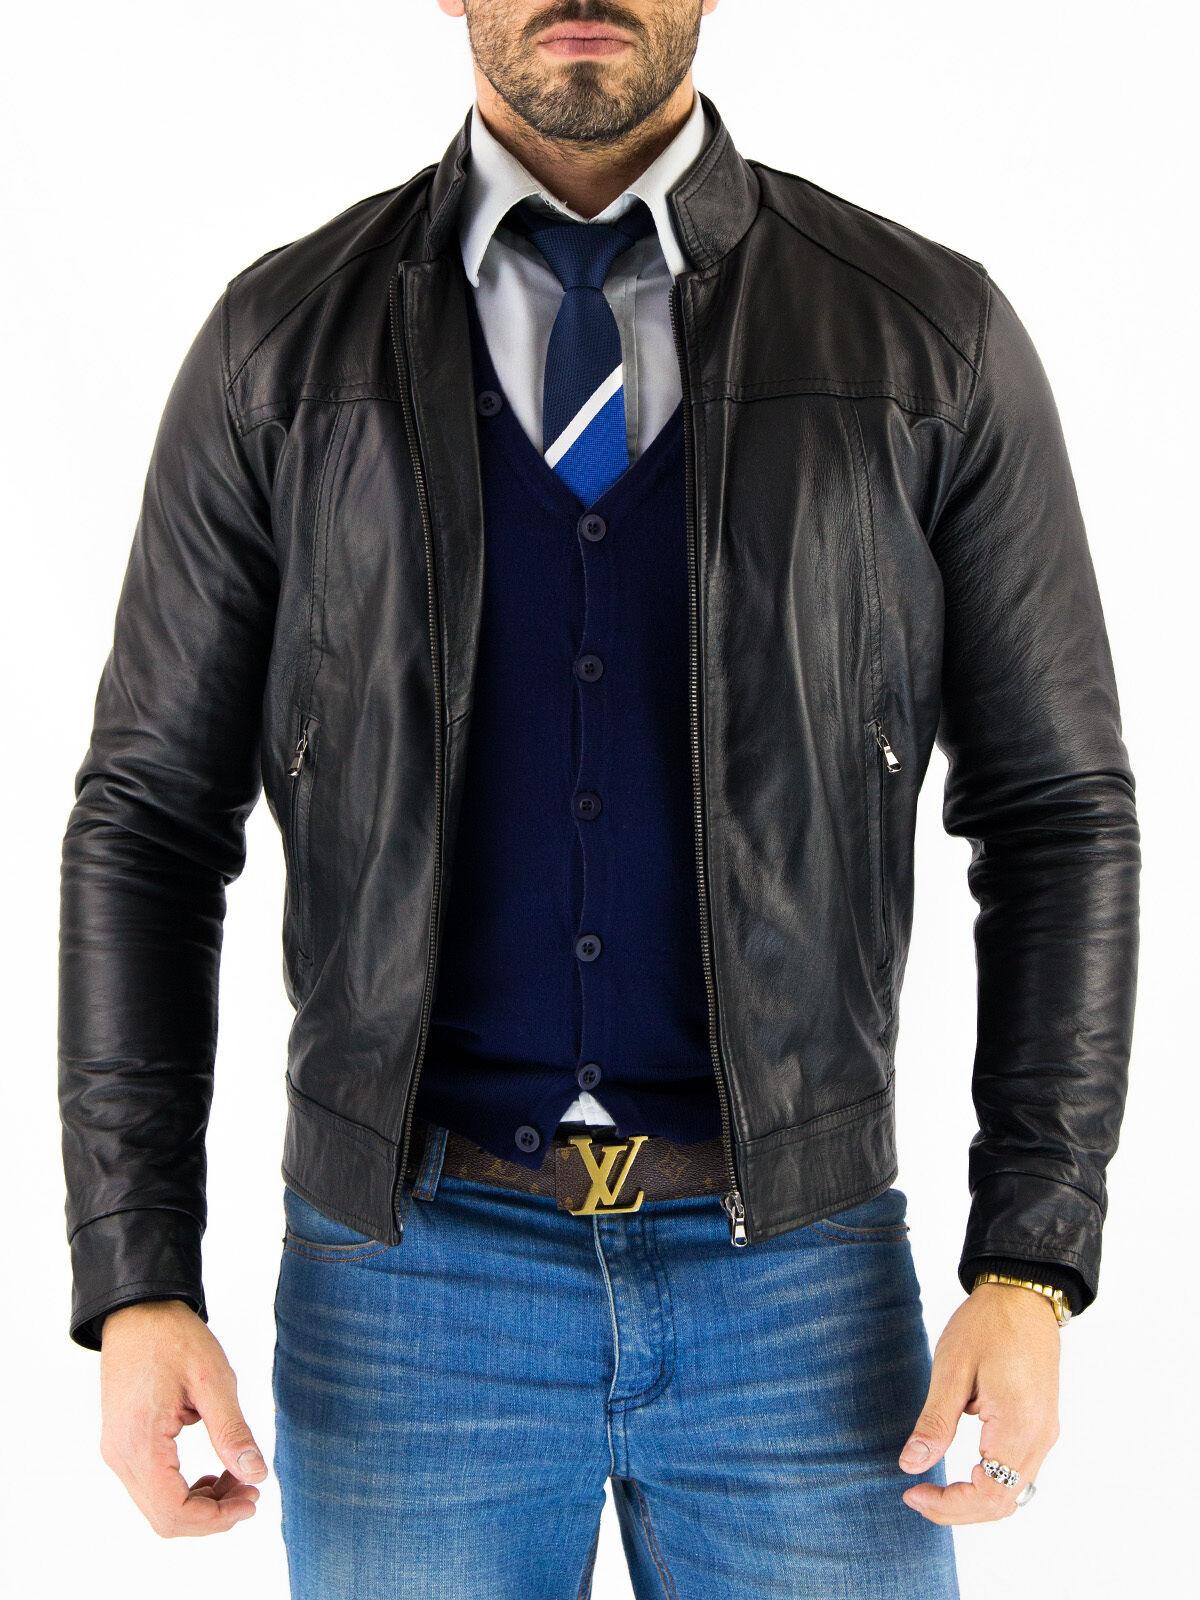 DE Herren Lederjacke Biker Manteau Veste en Cuir pour Homme Homme Veste En cuir T9hNj1